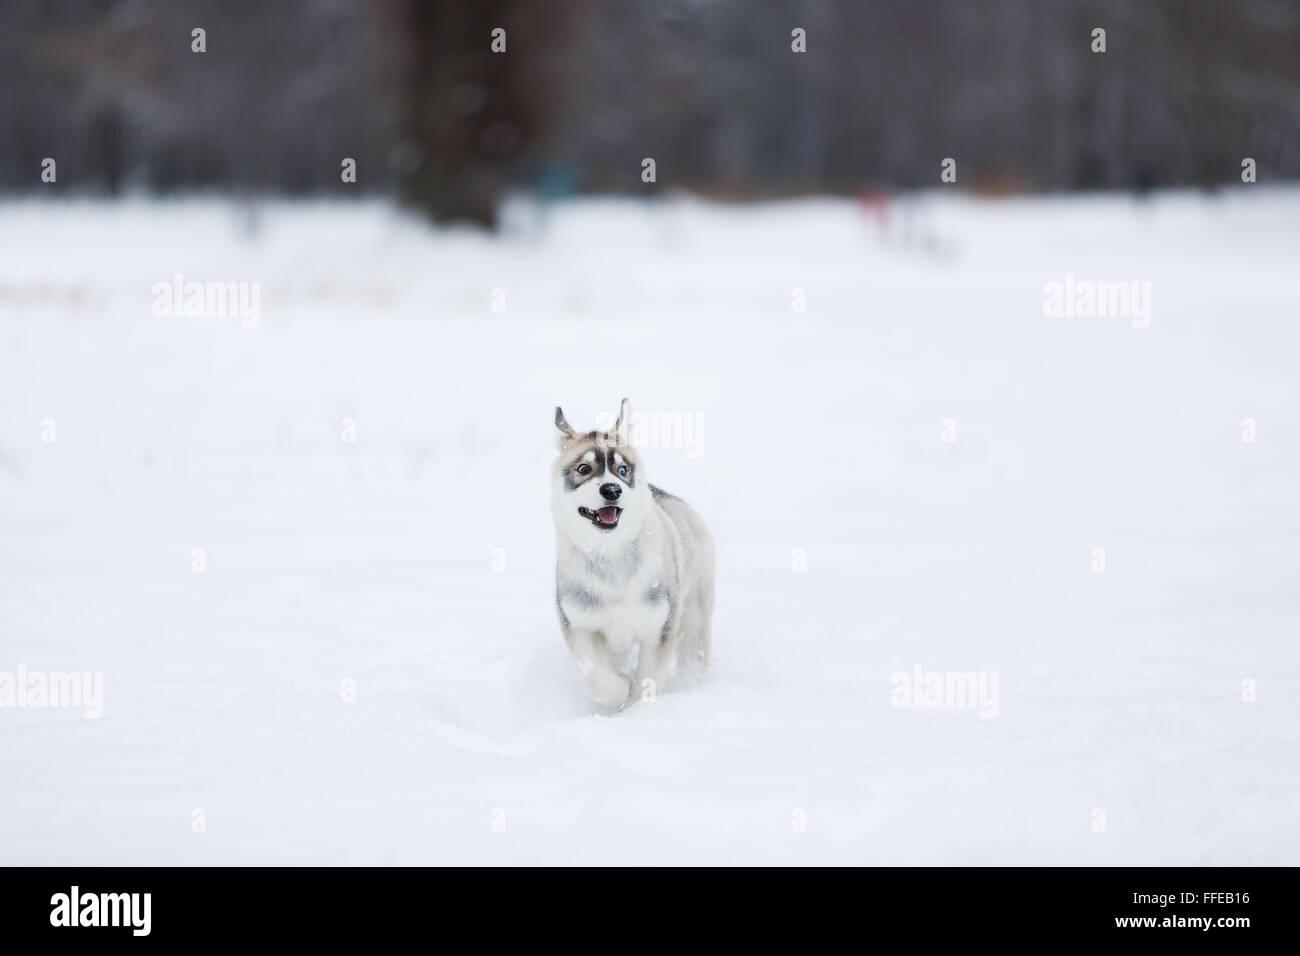 Berühmt Süße Husky Welpen Malvorlagen Fotos - Entry Level Resume ...